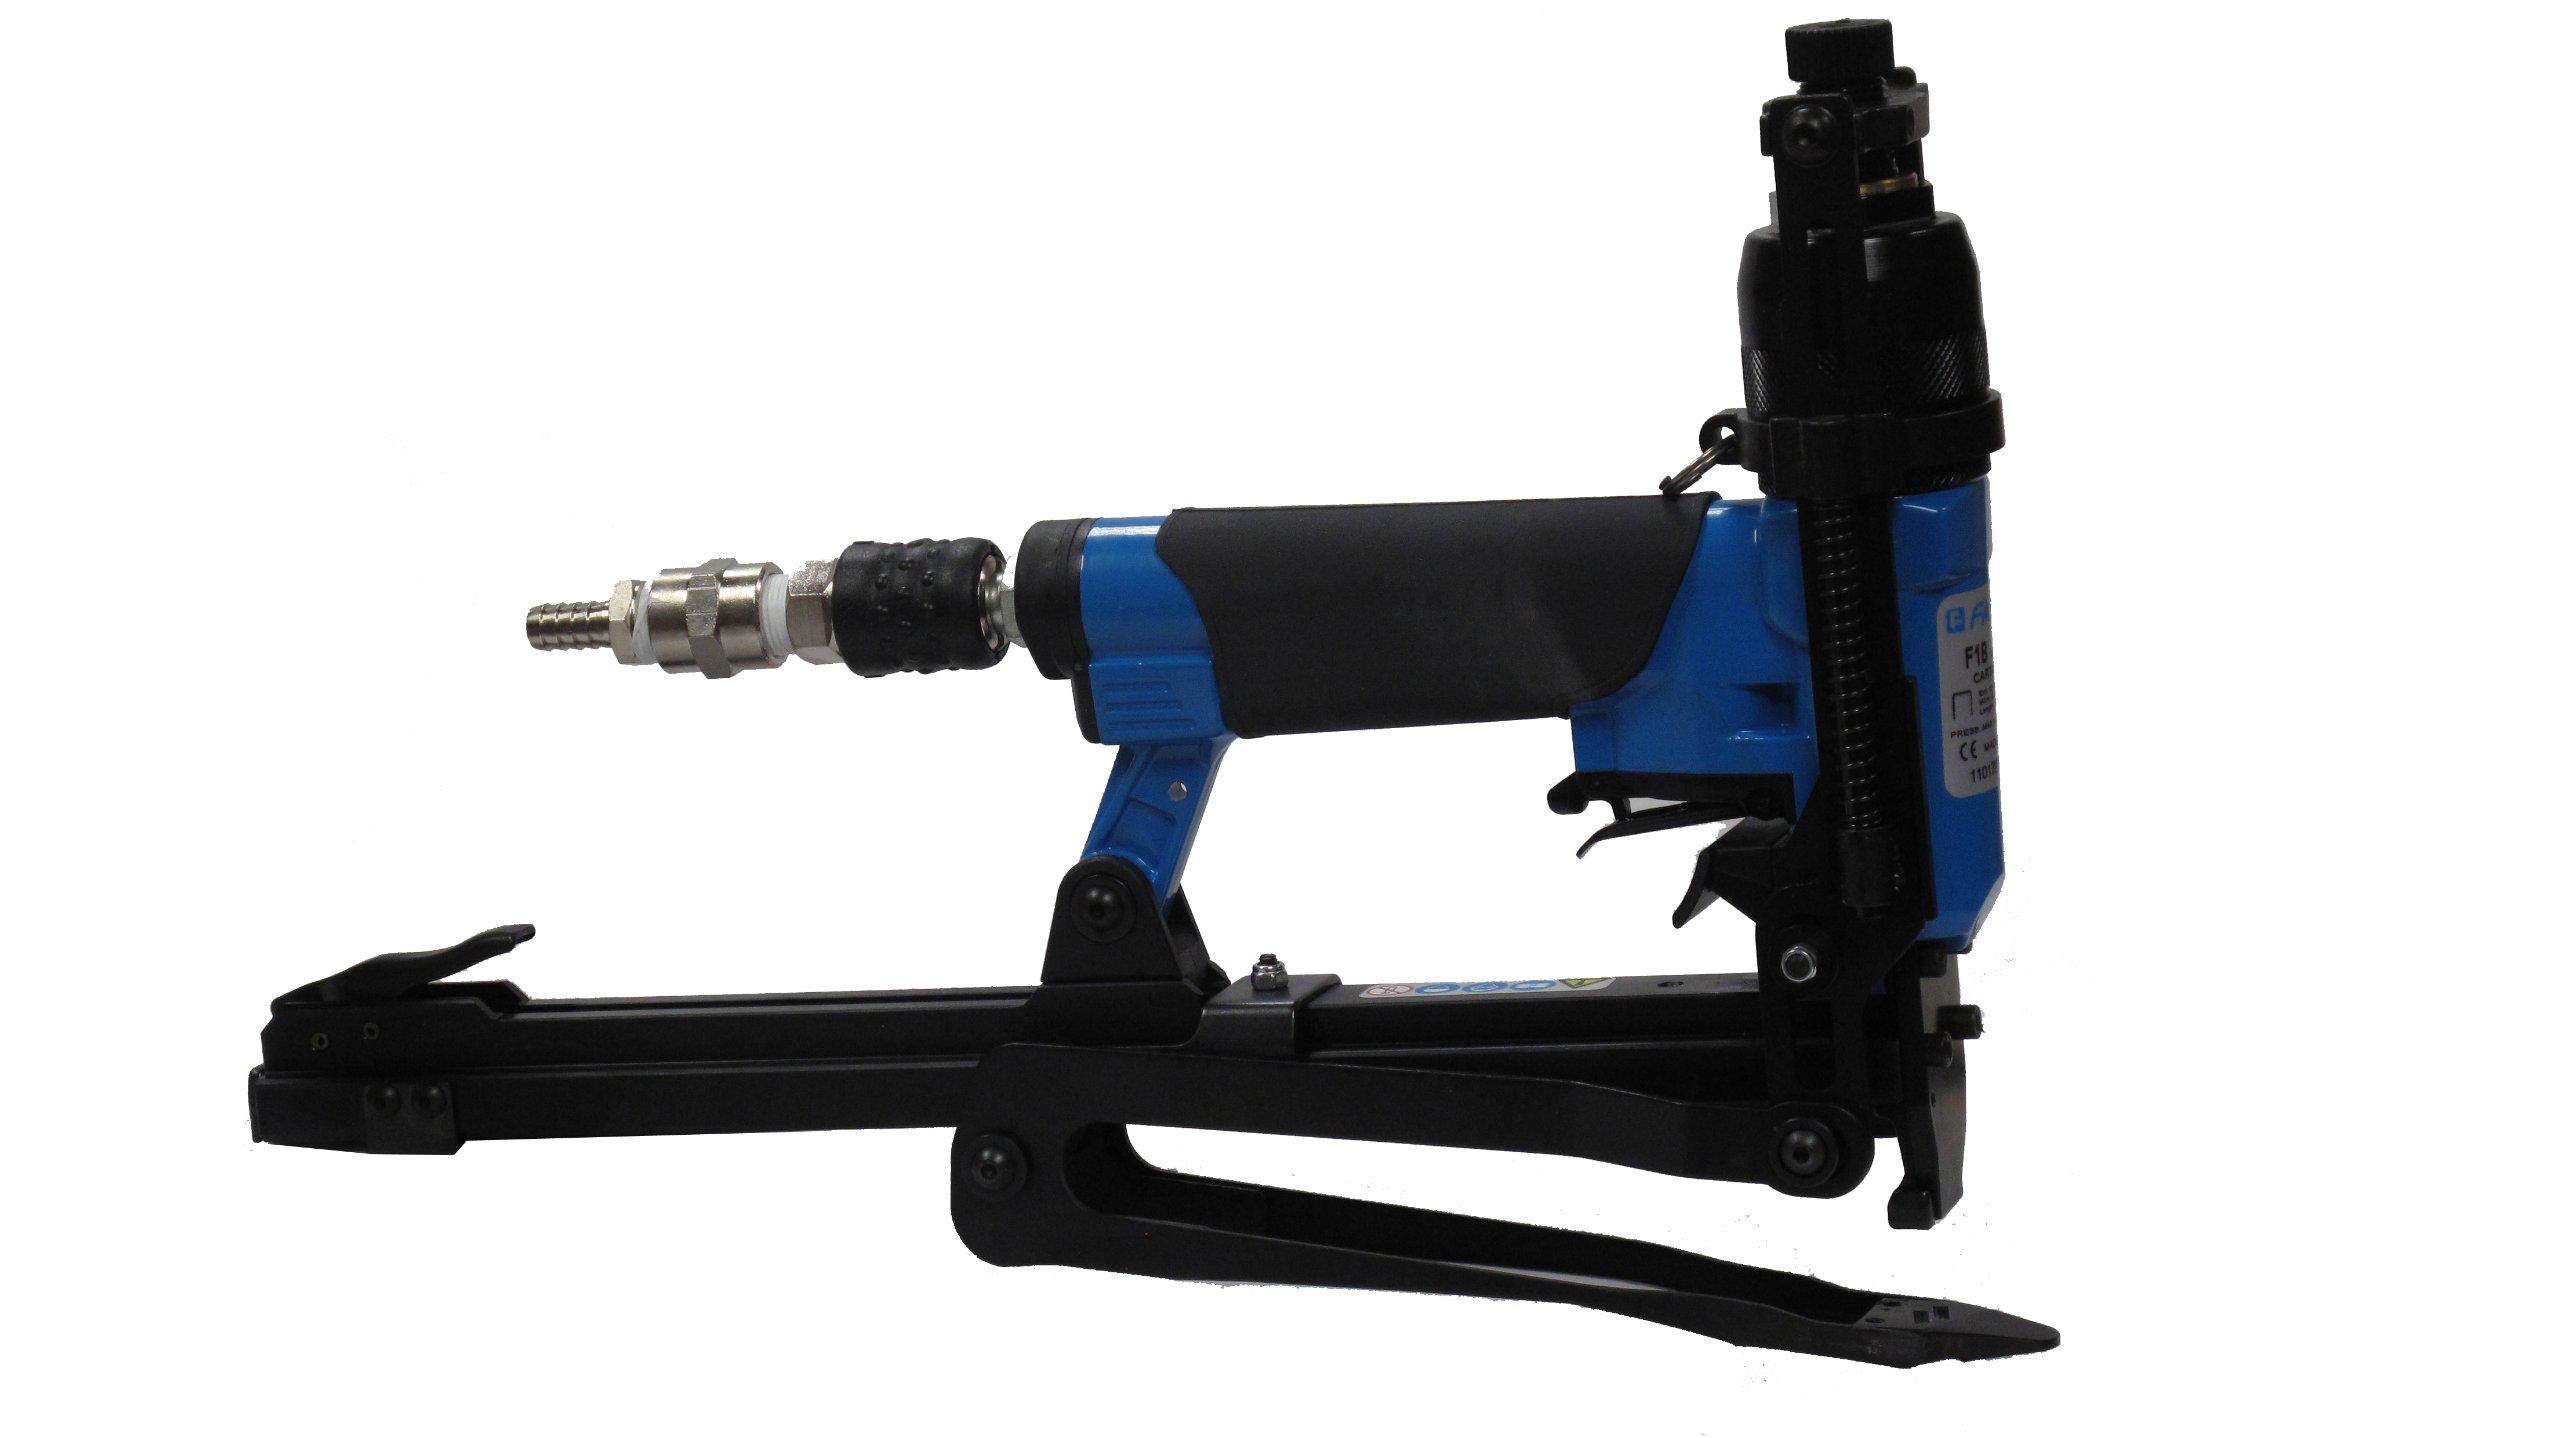 Fasco F1B 50-16 CARTON 11222F Plier Stapler for Duo Fast 50 Series Staples by Fasco